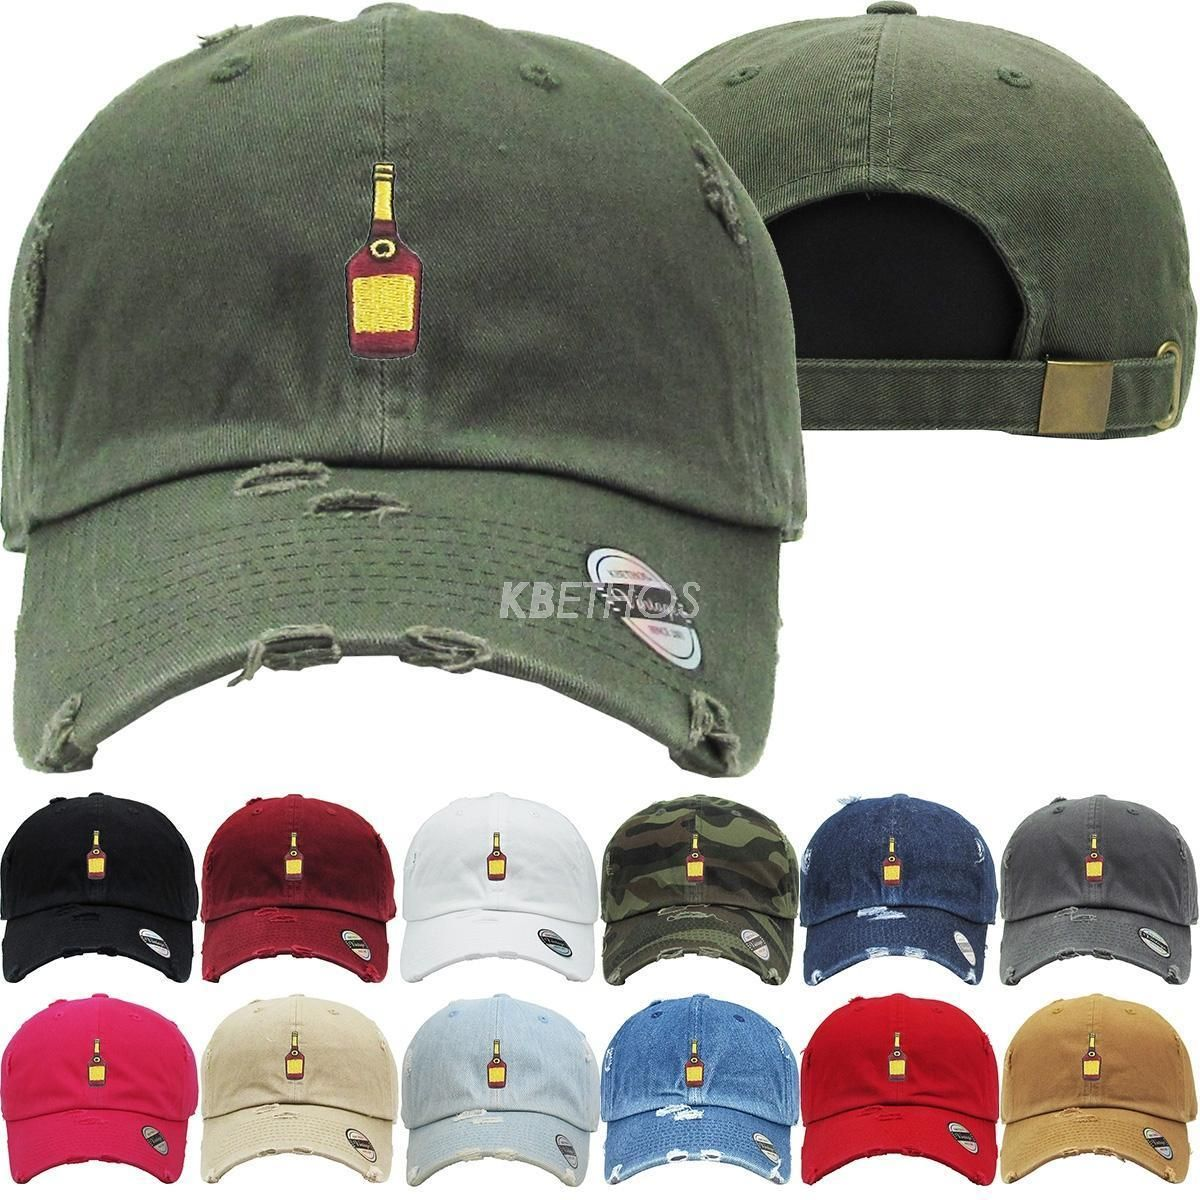 20328e52f42 Henny Bottle Dad Hat Baseball Cap Unconstructed - Kbethos